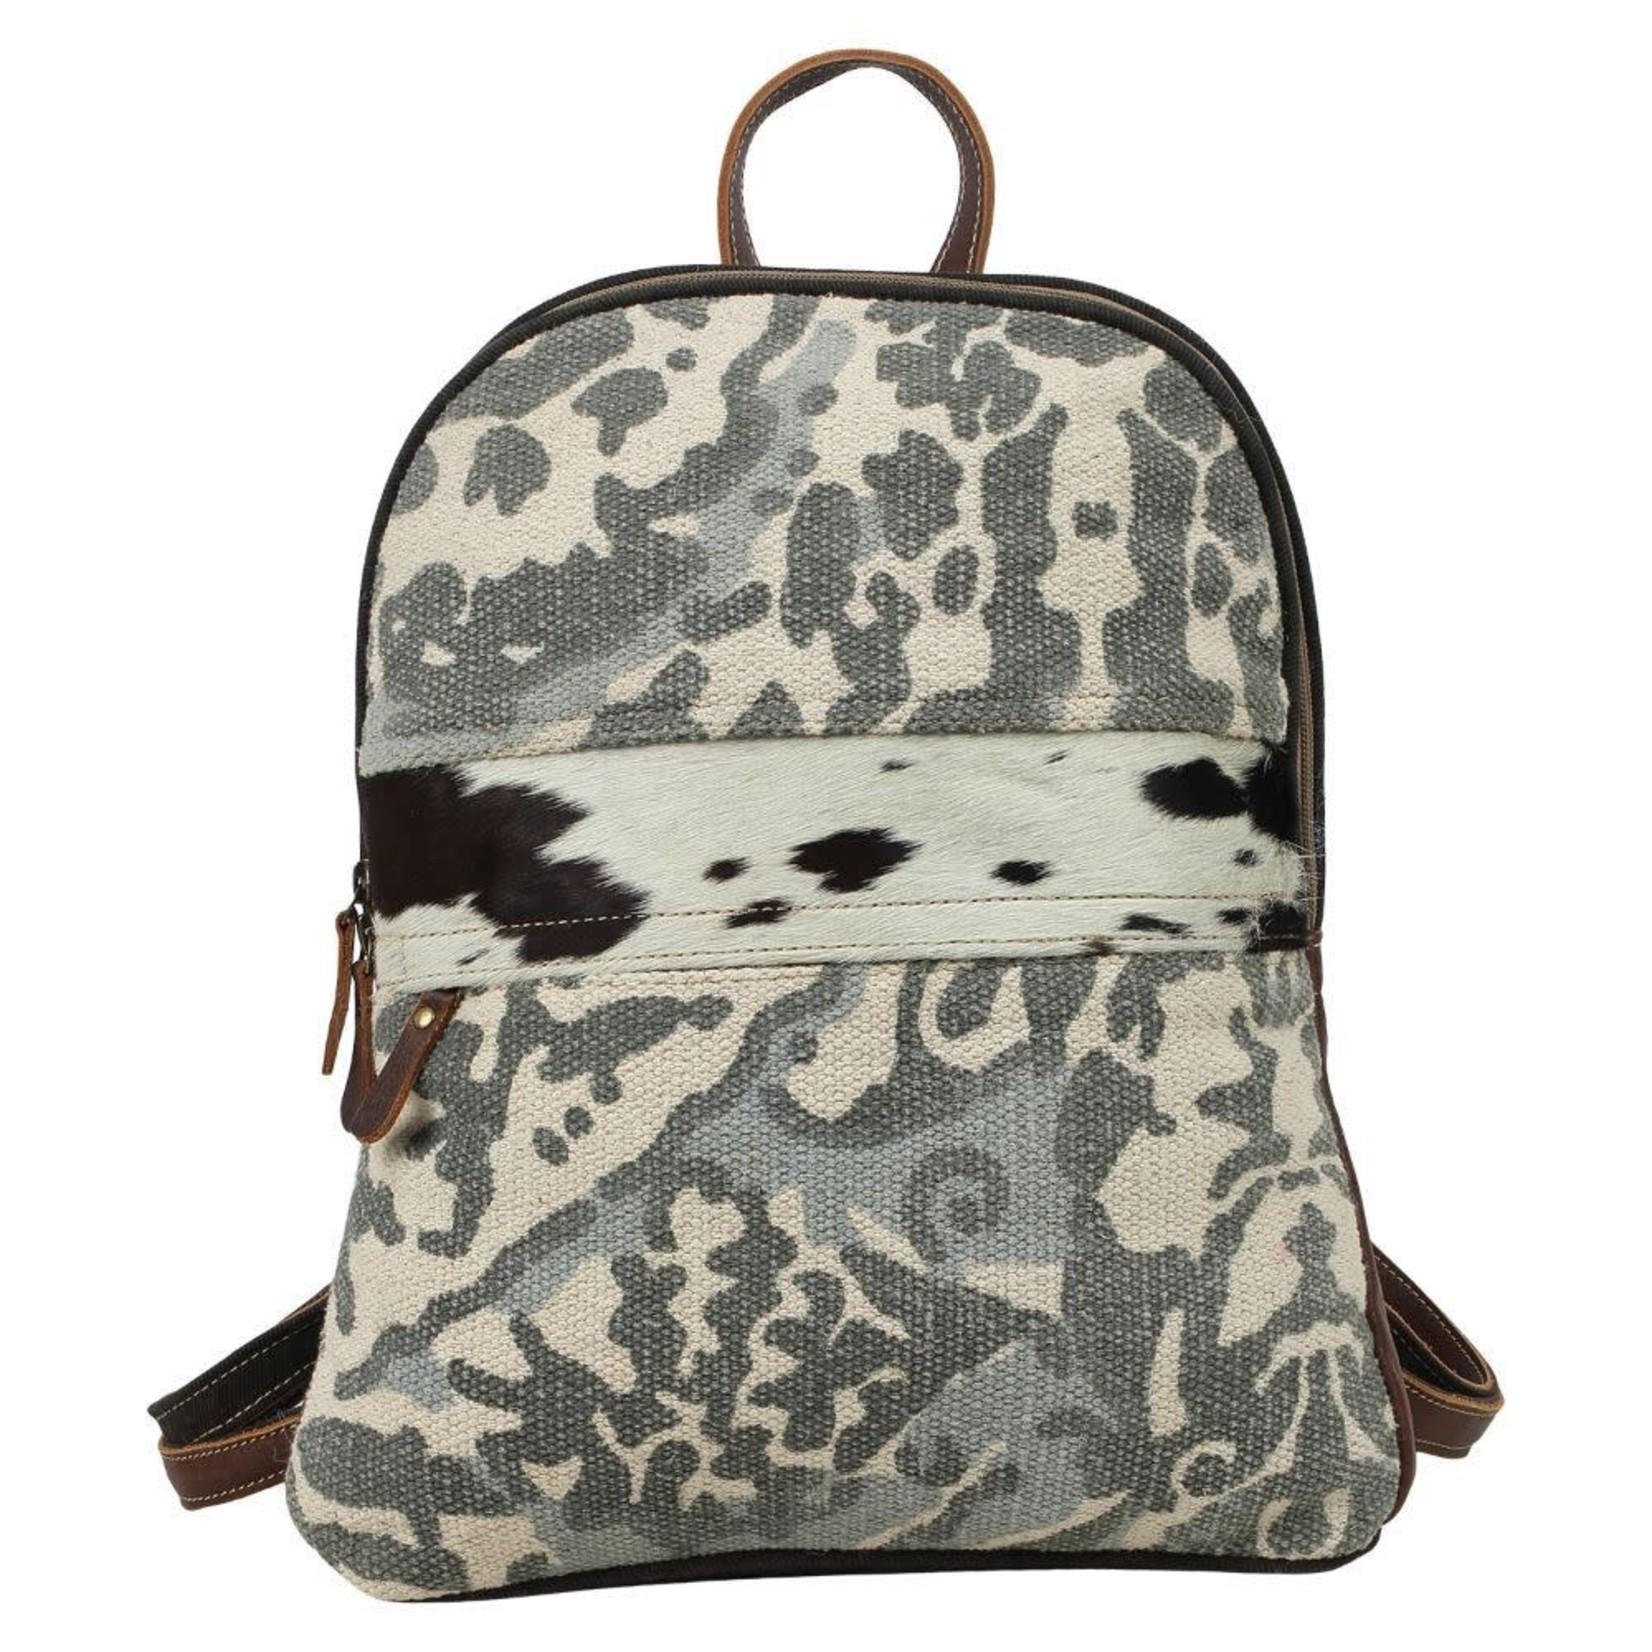 Myra Bags Dough Backpack